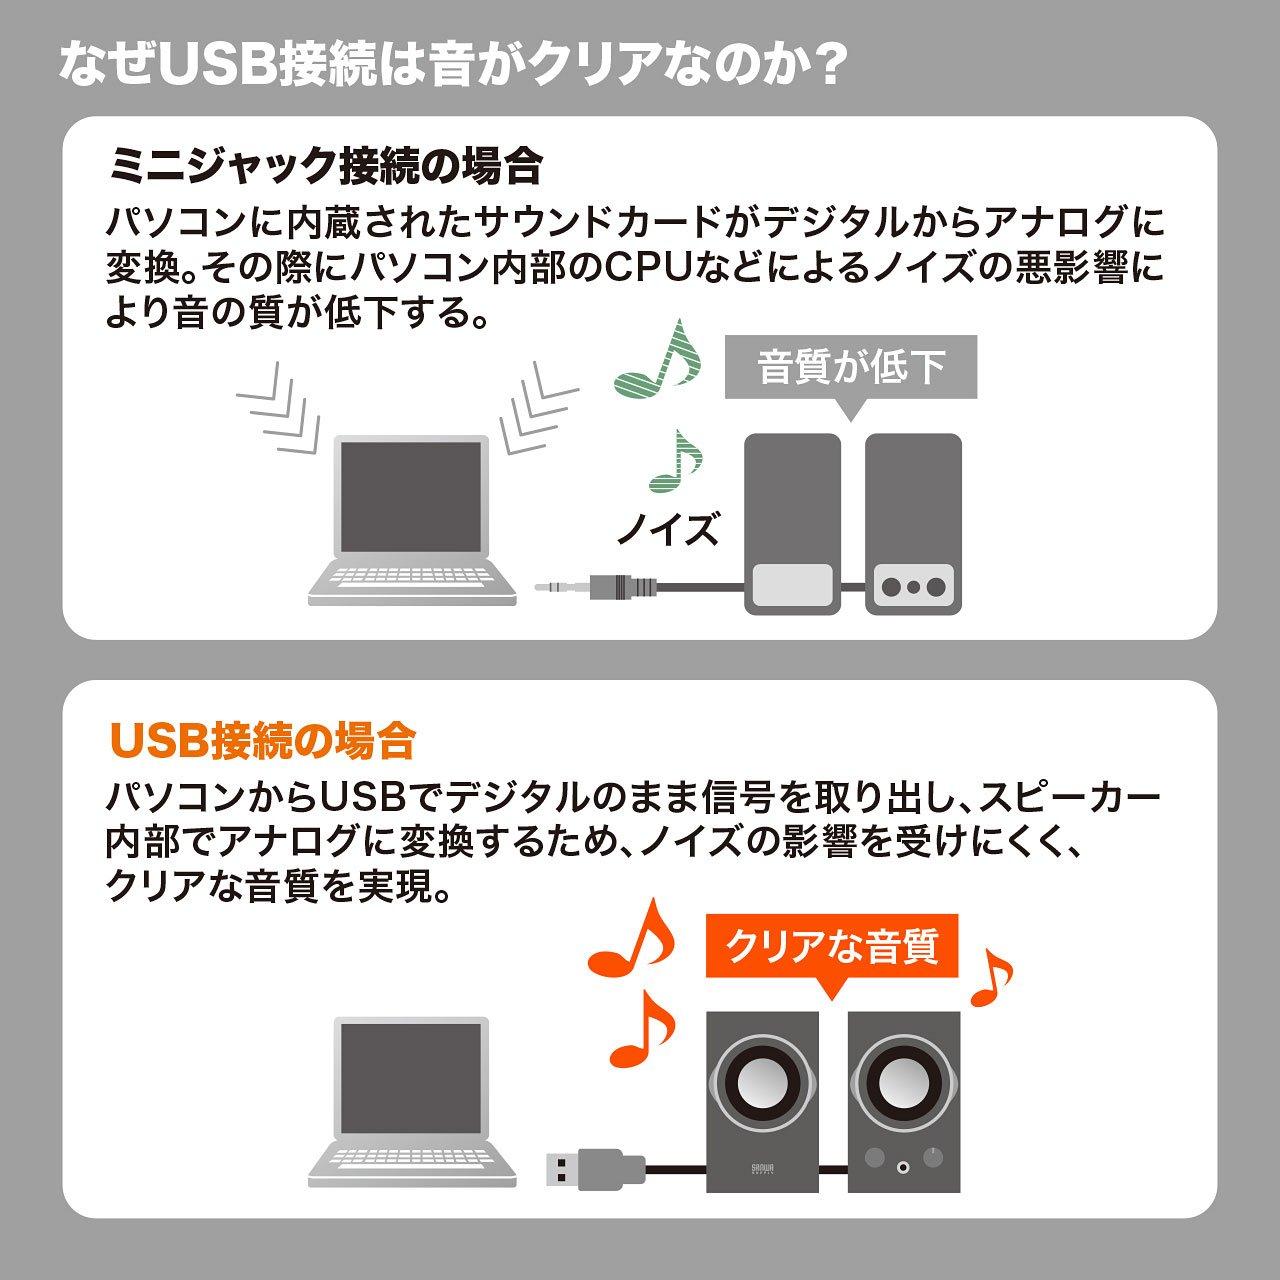 SANWA SUPPLY high-power USB speaker MM-SPU9BK (Black) by Sanwa (Image #6)